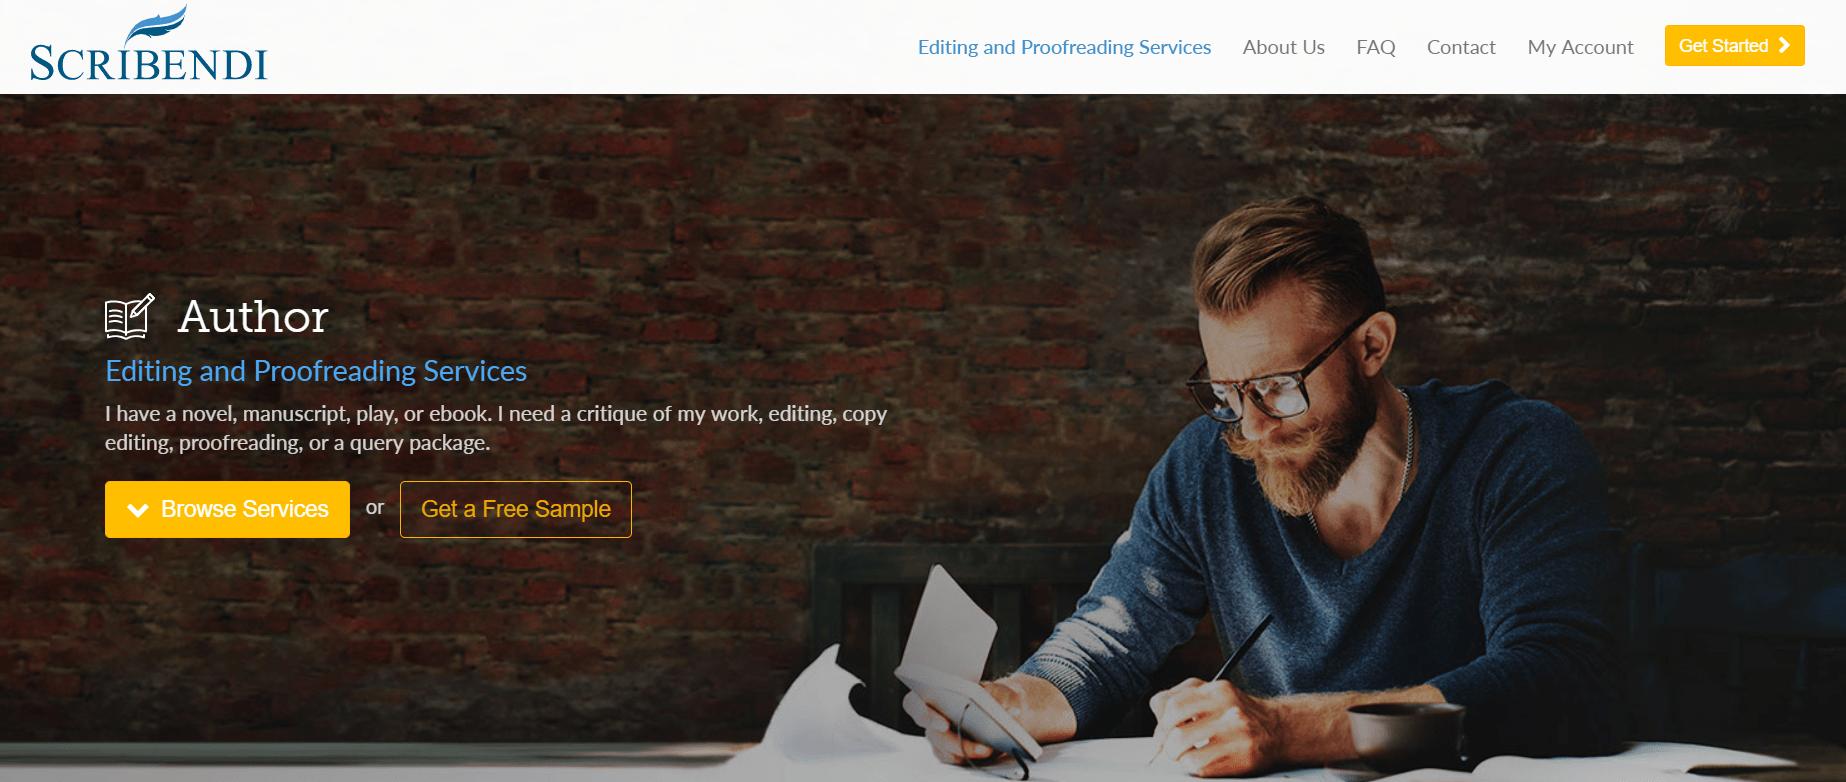 Scribendi Review- Manuscript Services for Authors